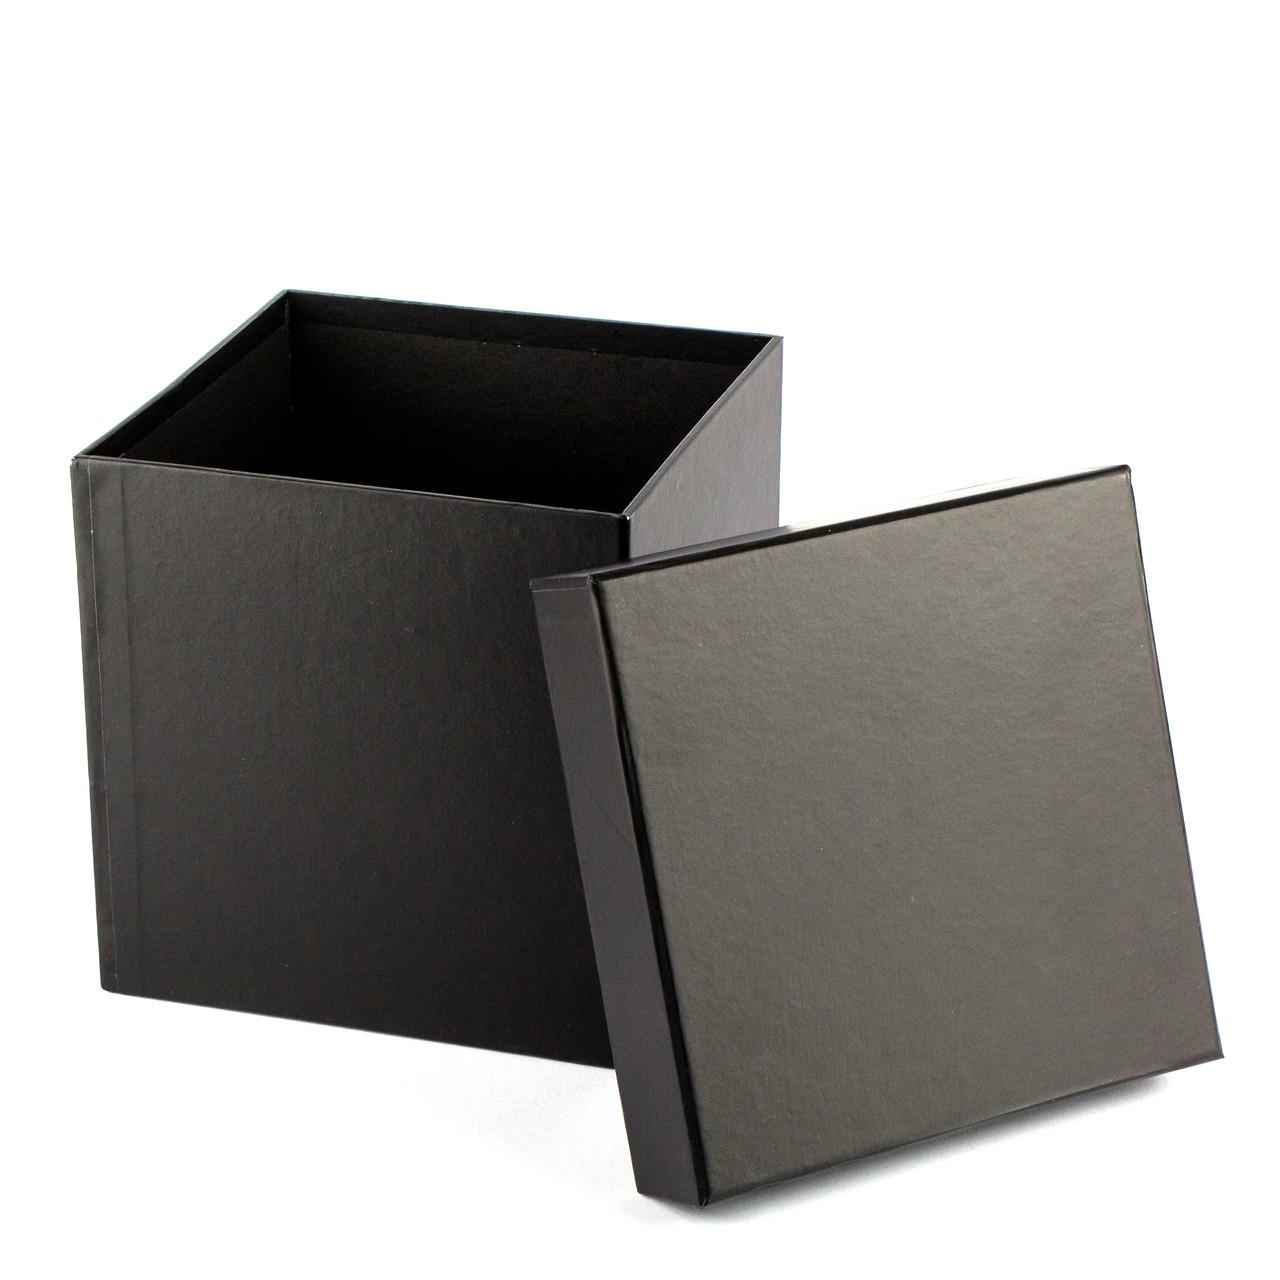 Подарочная коробка черная 16x16x16 см